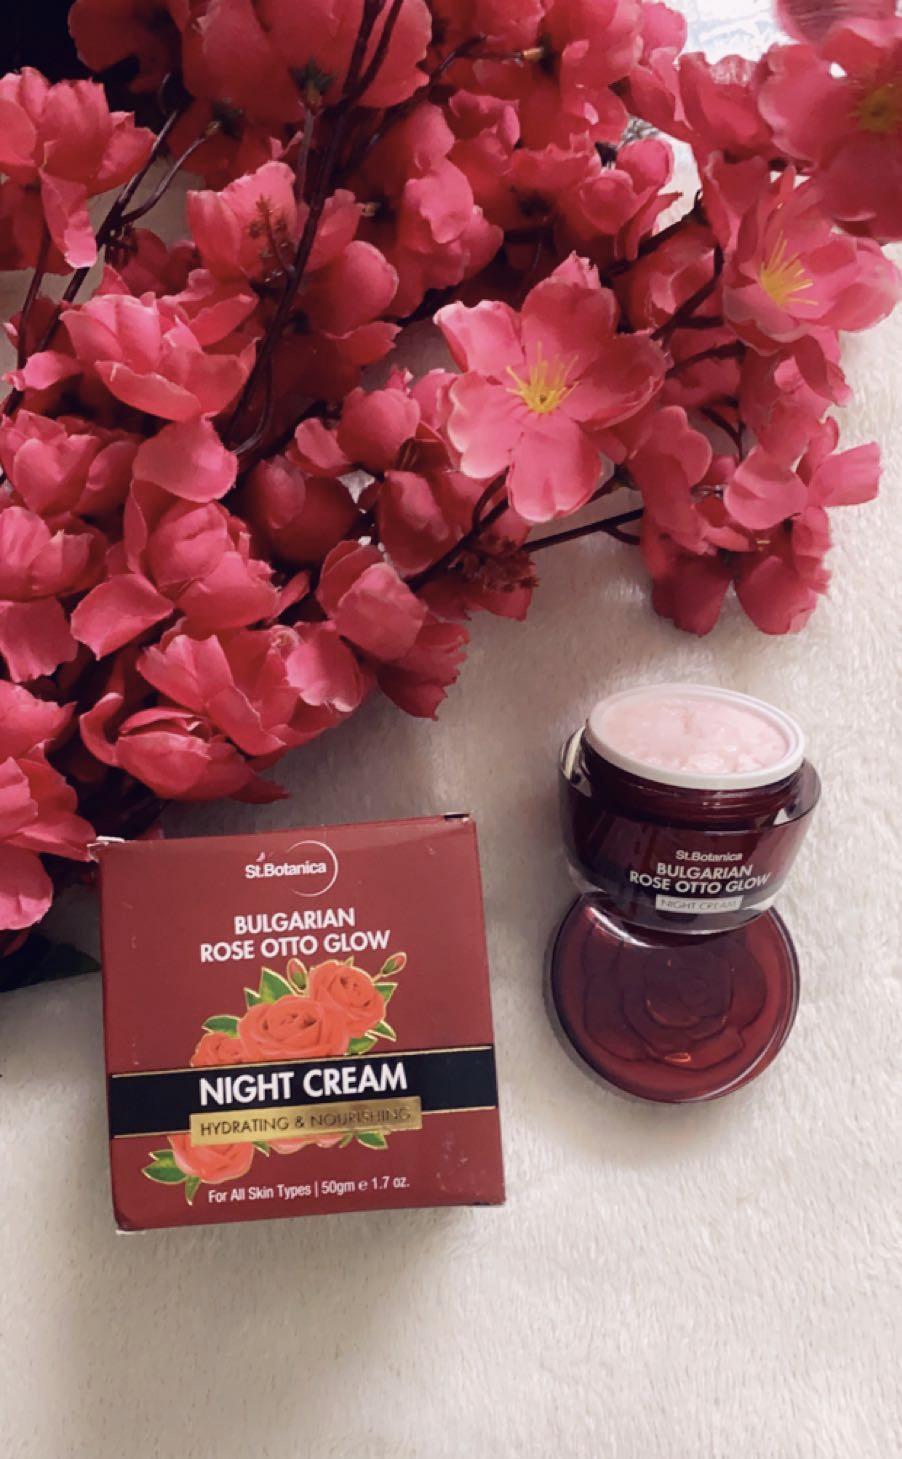 St.Botanica Bulgarian Rose Otto Glow Night Cream -Get rid of dull skin-By ritika_malik